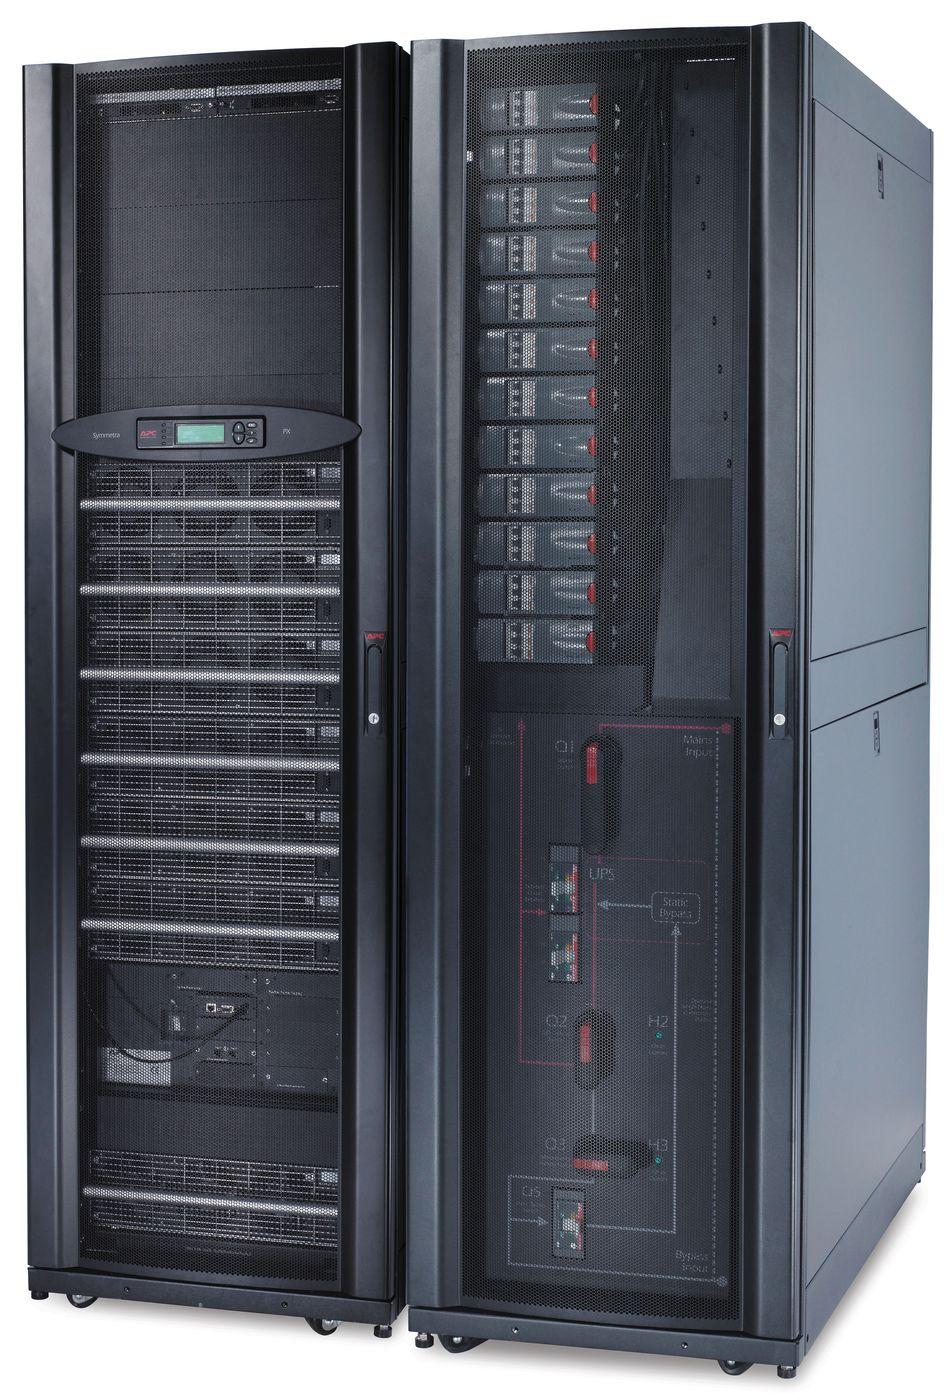 APC by Schneider Electric Symmetra PX 160kWSY96K160H-PD